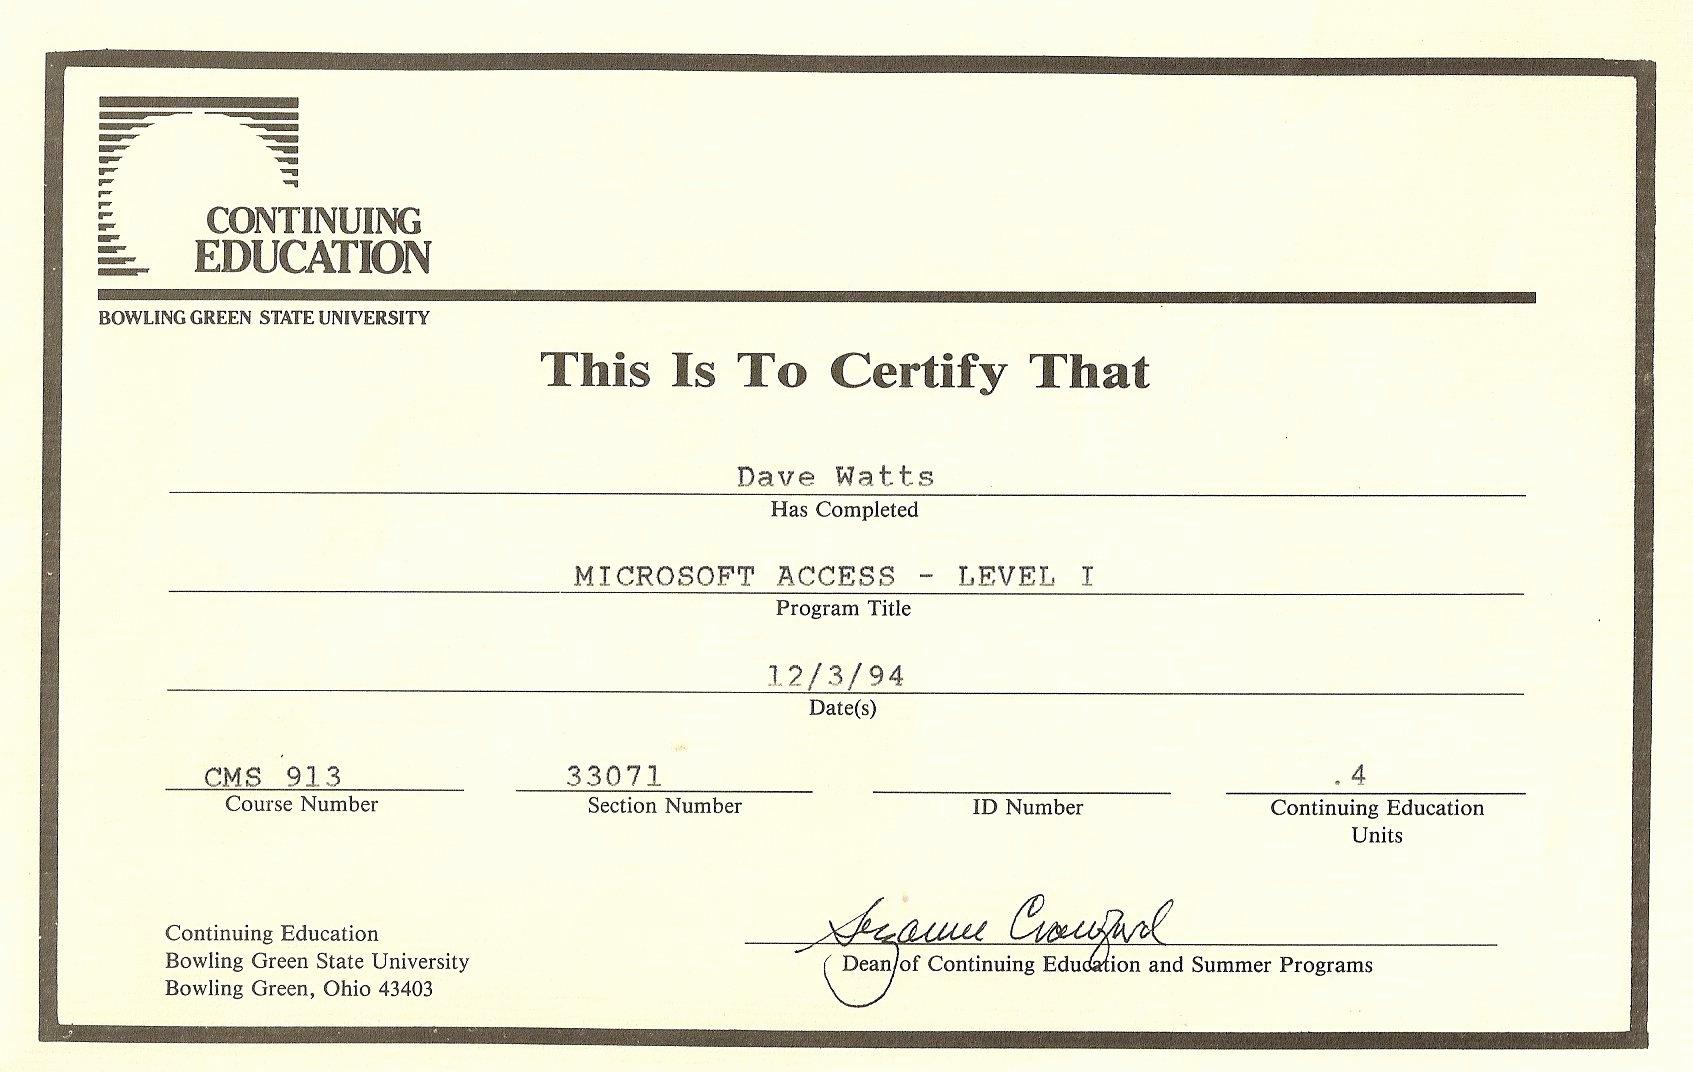 Continuing Education Certificate Template Awesome Nursing Ceu Certificate Template